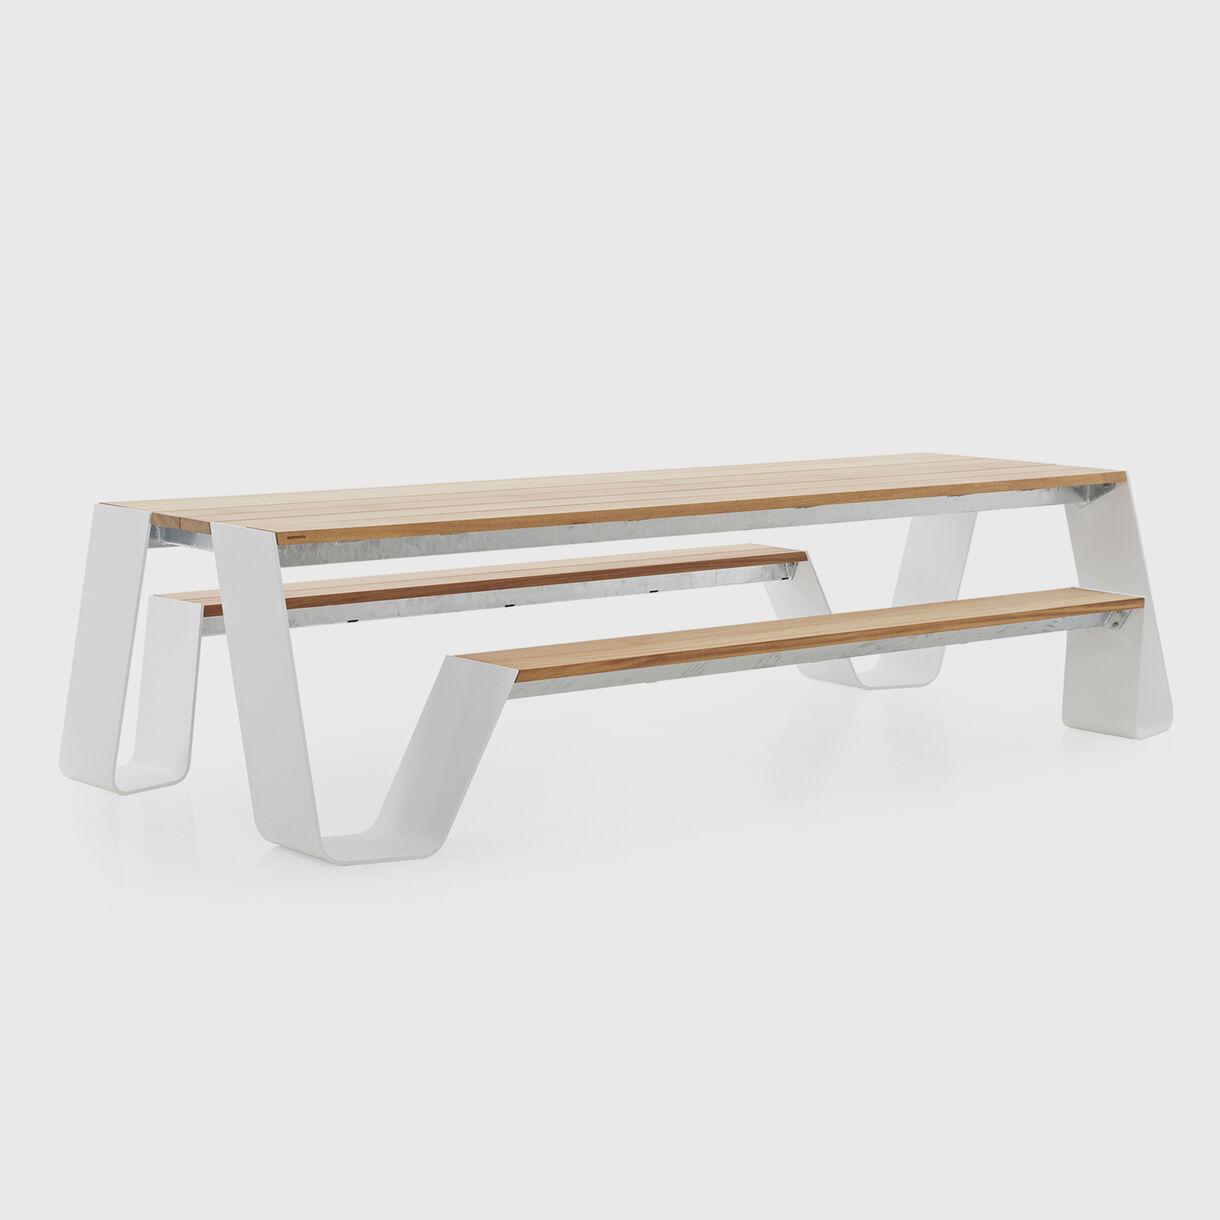 Hopper Picnic Table